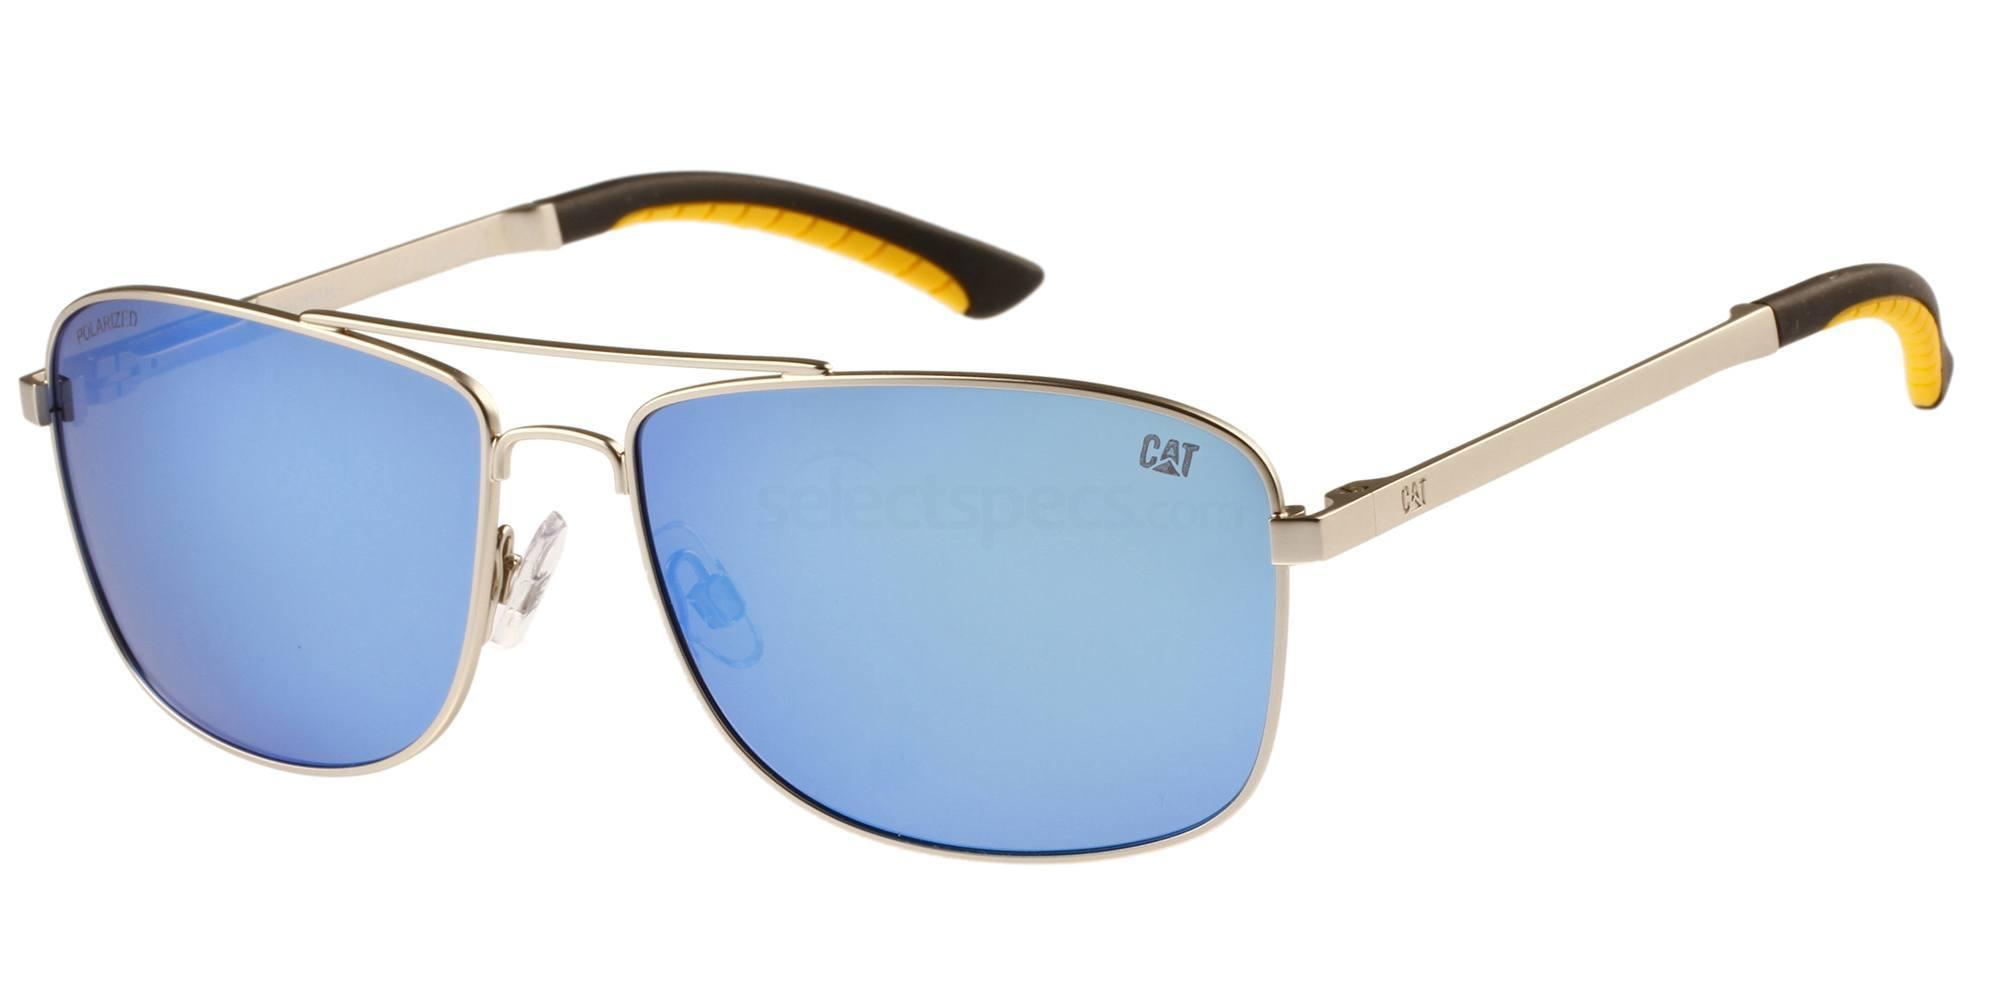 002P CTS-1504-P Sunglasses, CAT